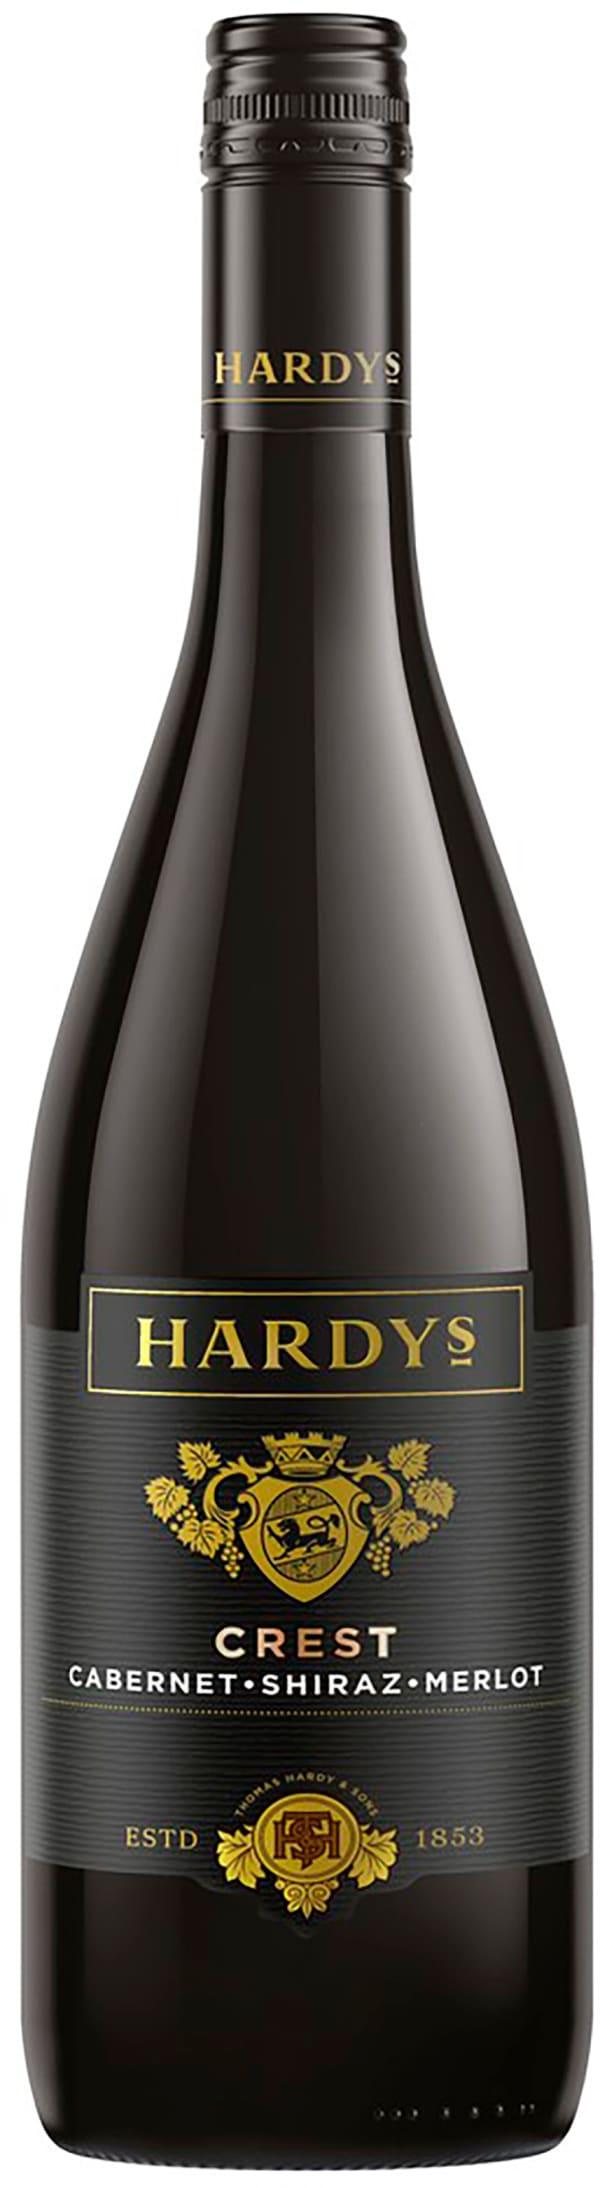 Hardys Crest Cabernet Shiraz Merlot 2017